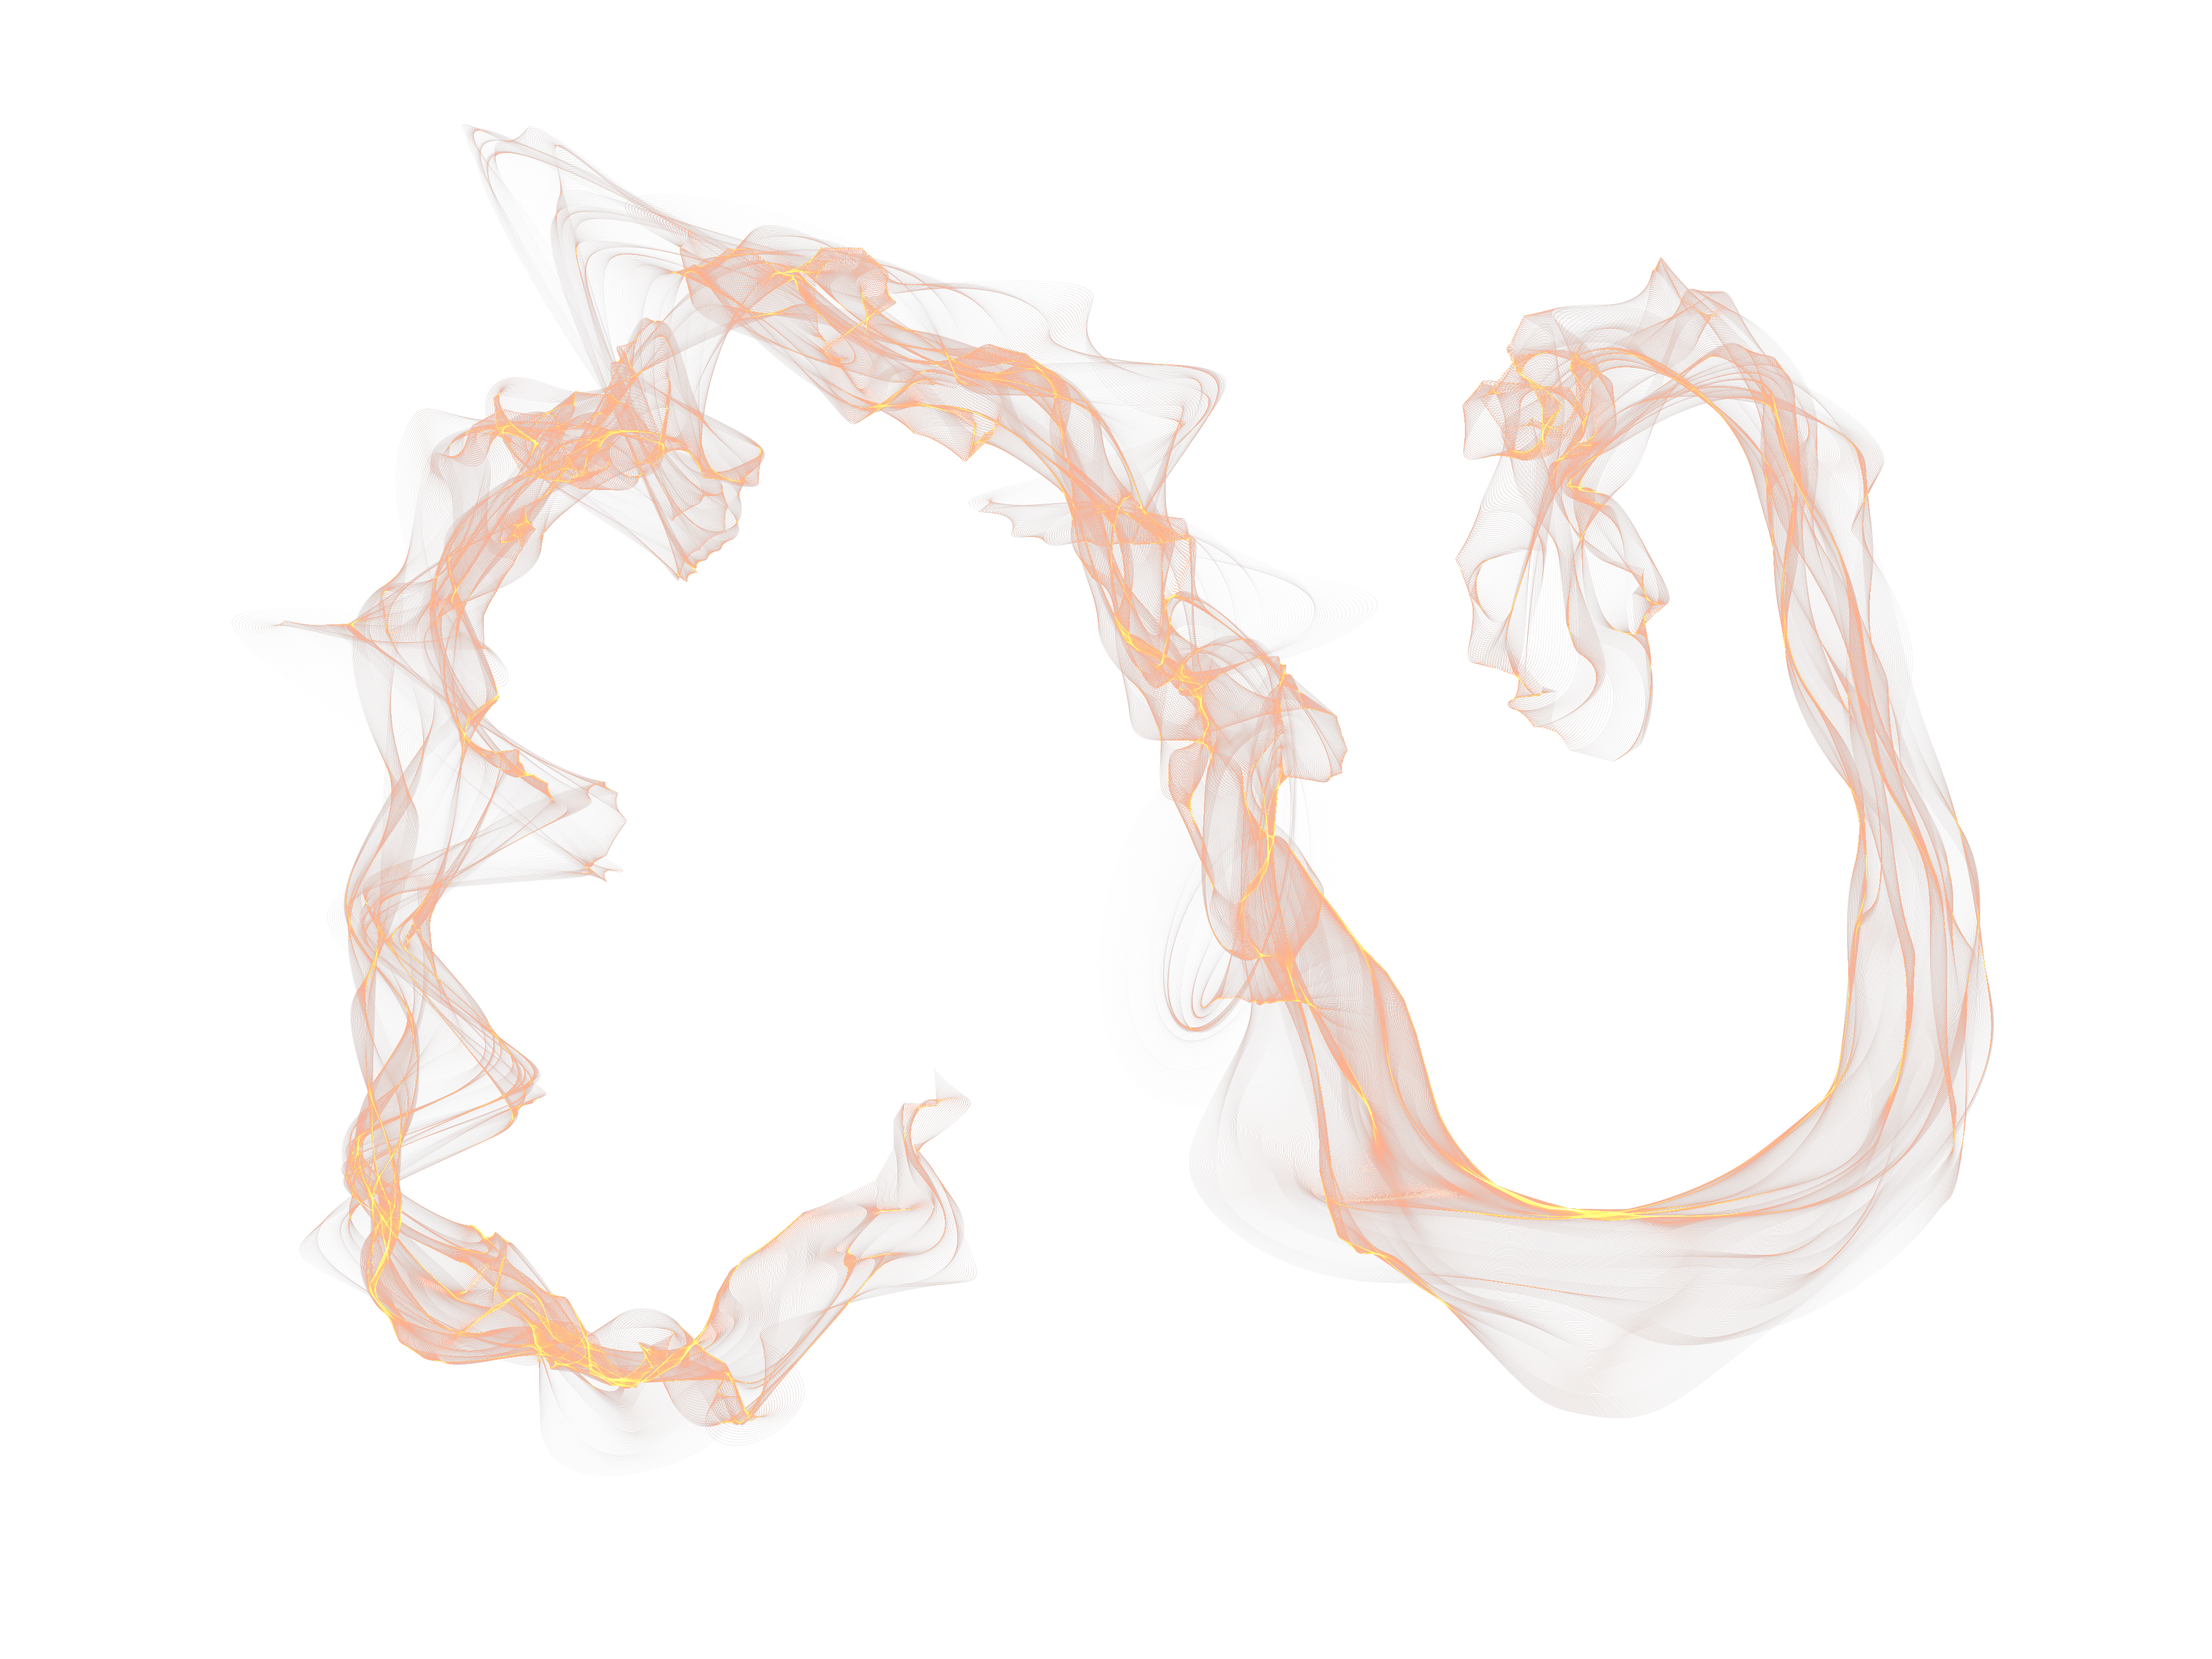 17 PSD Transparent Smoke Images - Photoshop Smokebrush ...